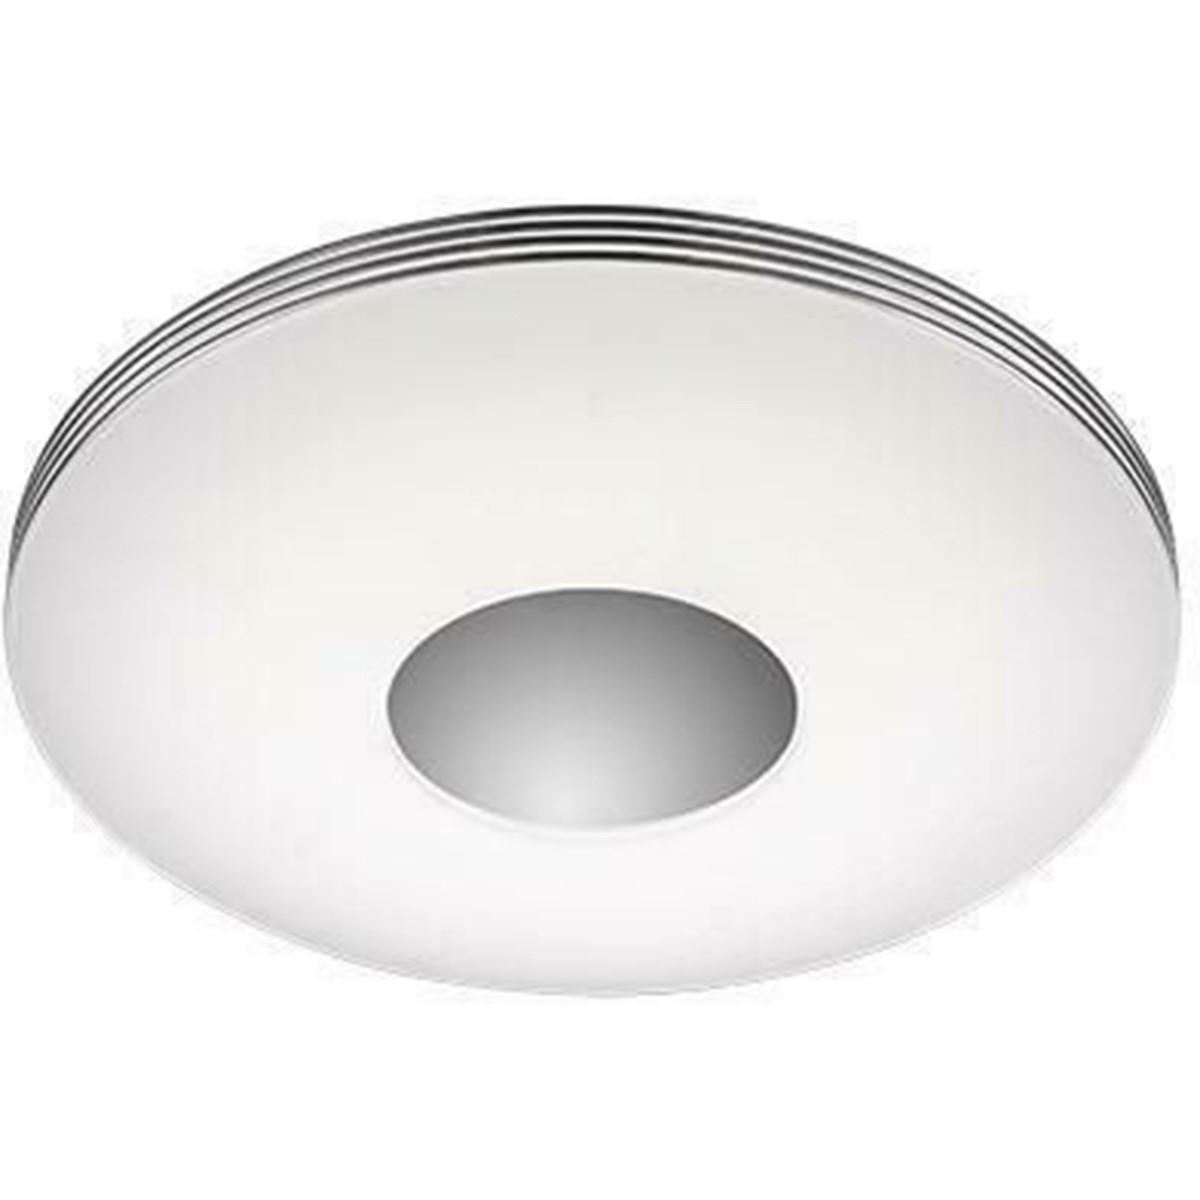 LED Plafondlamp - Trion Castonar - 25W - Aanpasbare Kleur - Dimbaar - Afstandsbediening - Rond - Gla